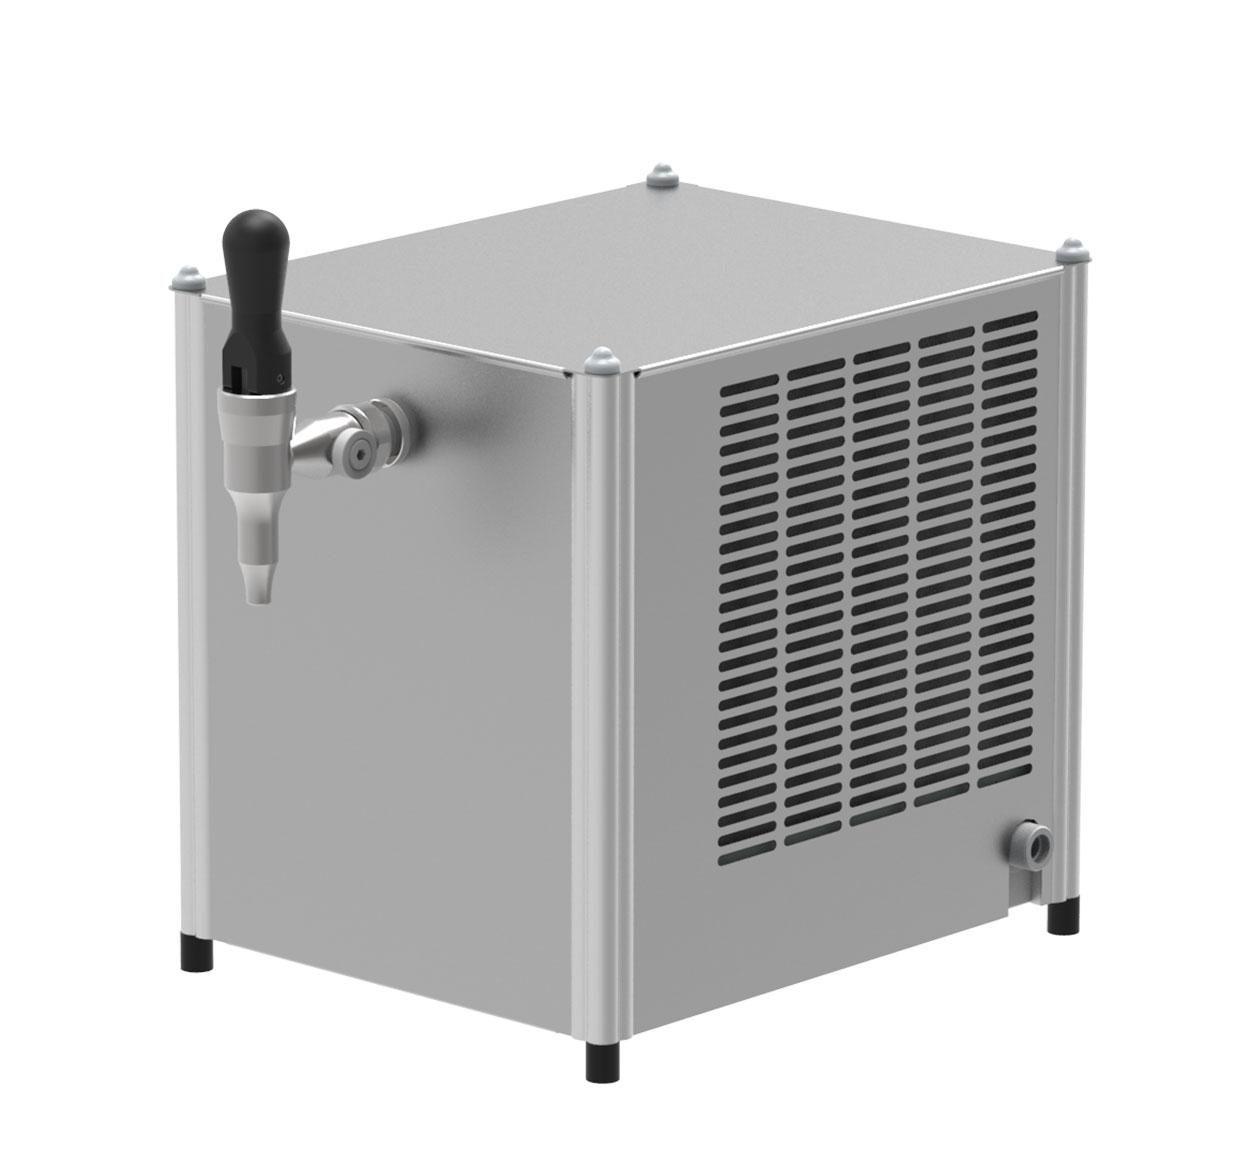 DF05-KVT Vandkøler